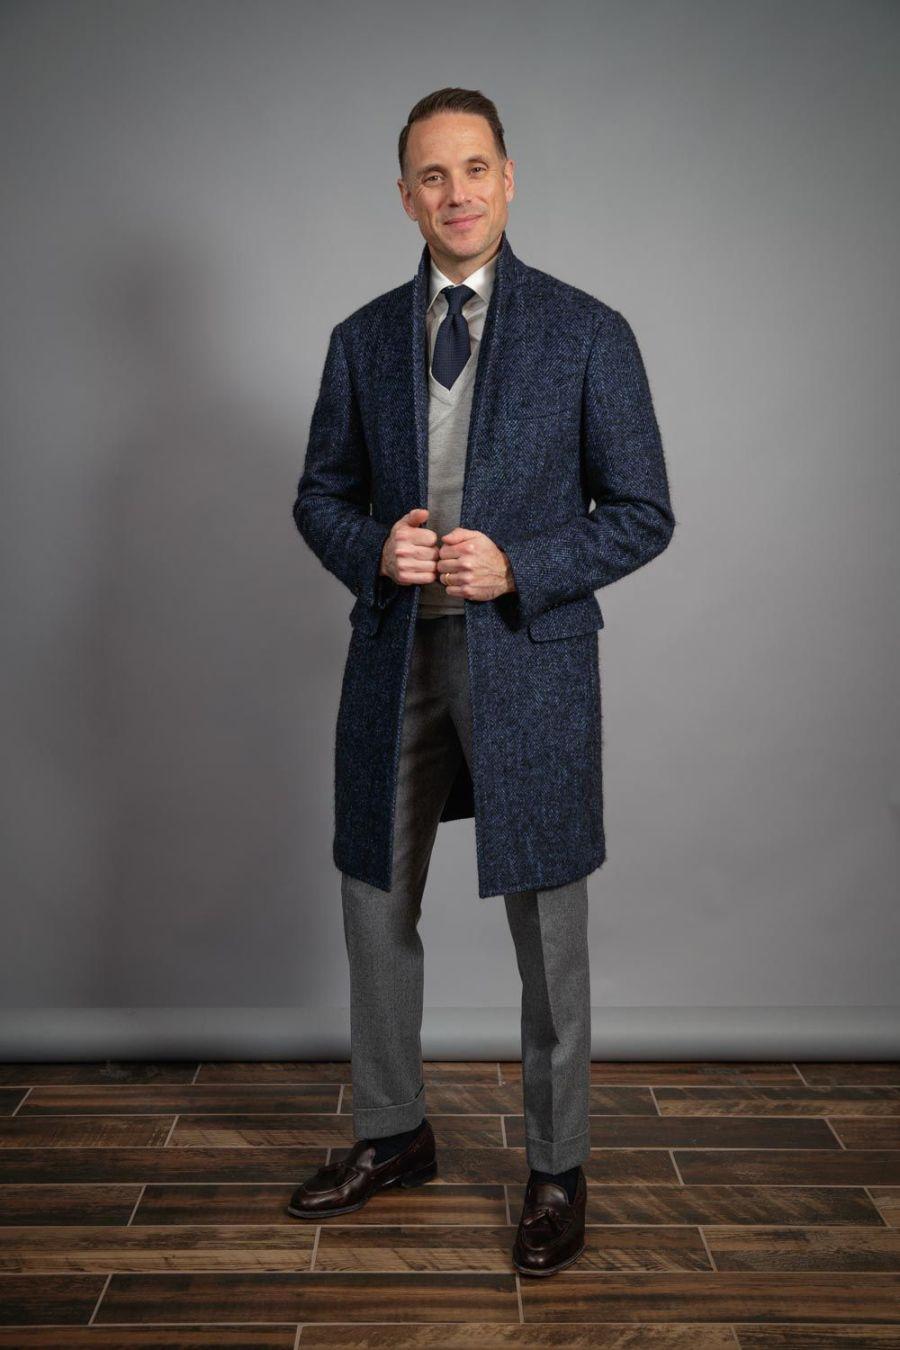 grey-v-neck-sweater-with-grenadine-tie-tassel-loafers-for-men